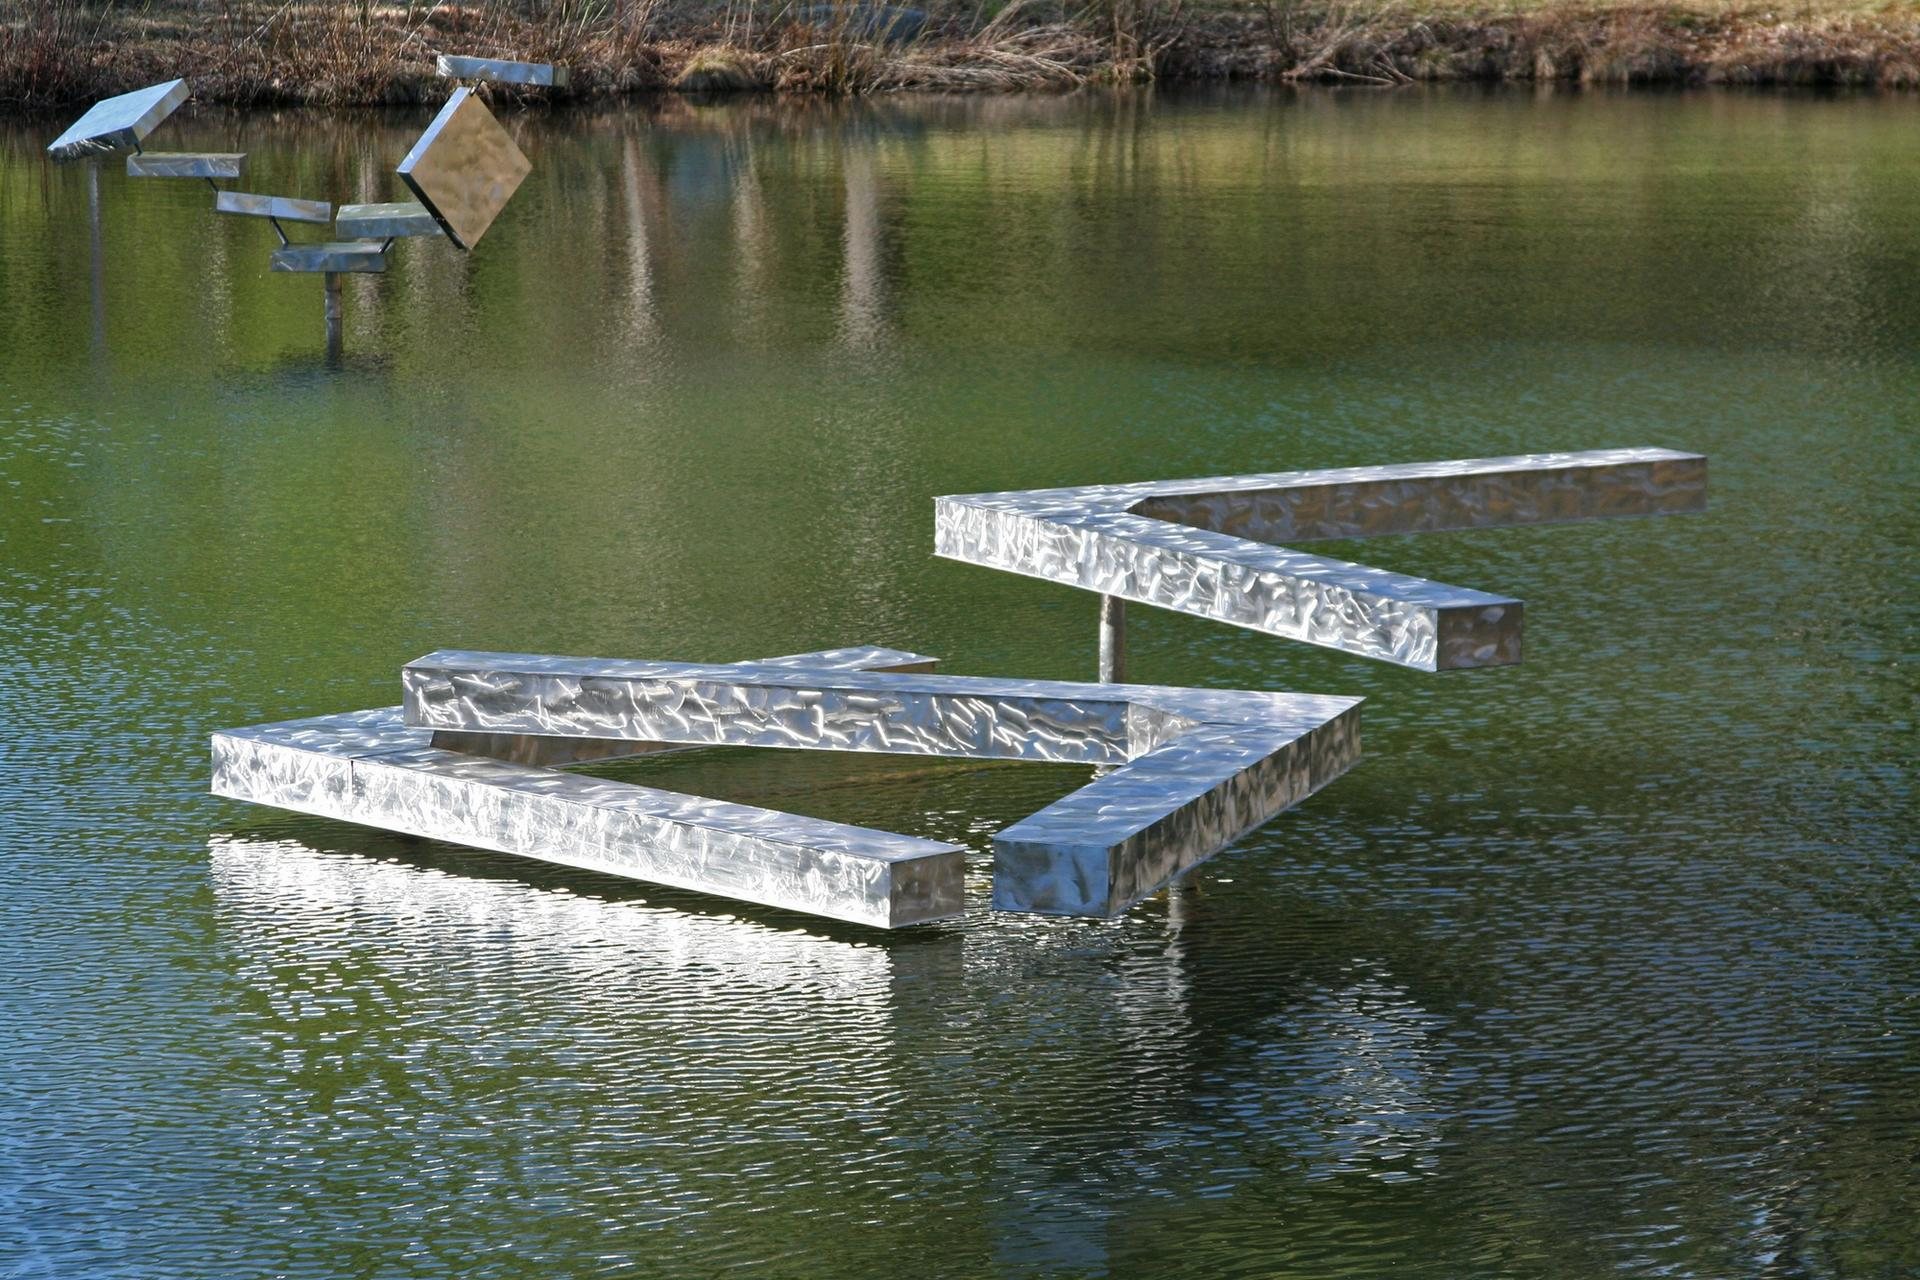 George Rickey, Three Right Angles Horizontal – IGA (Pond), 1983 Photo: Marc Zaref © George Rickey Foundation, Inc. and Estate of George Rickey, LLC / licensed by ARS, New York